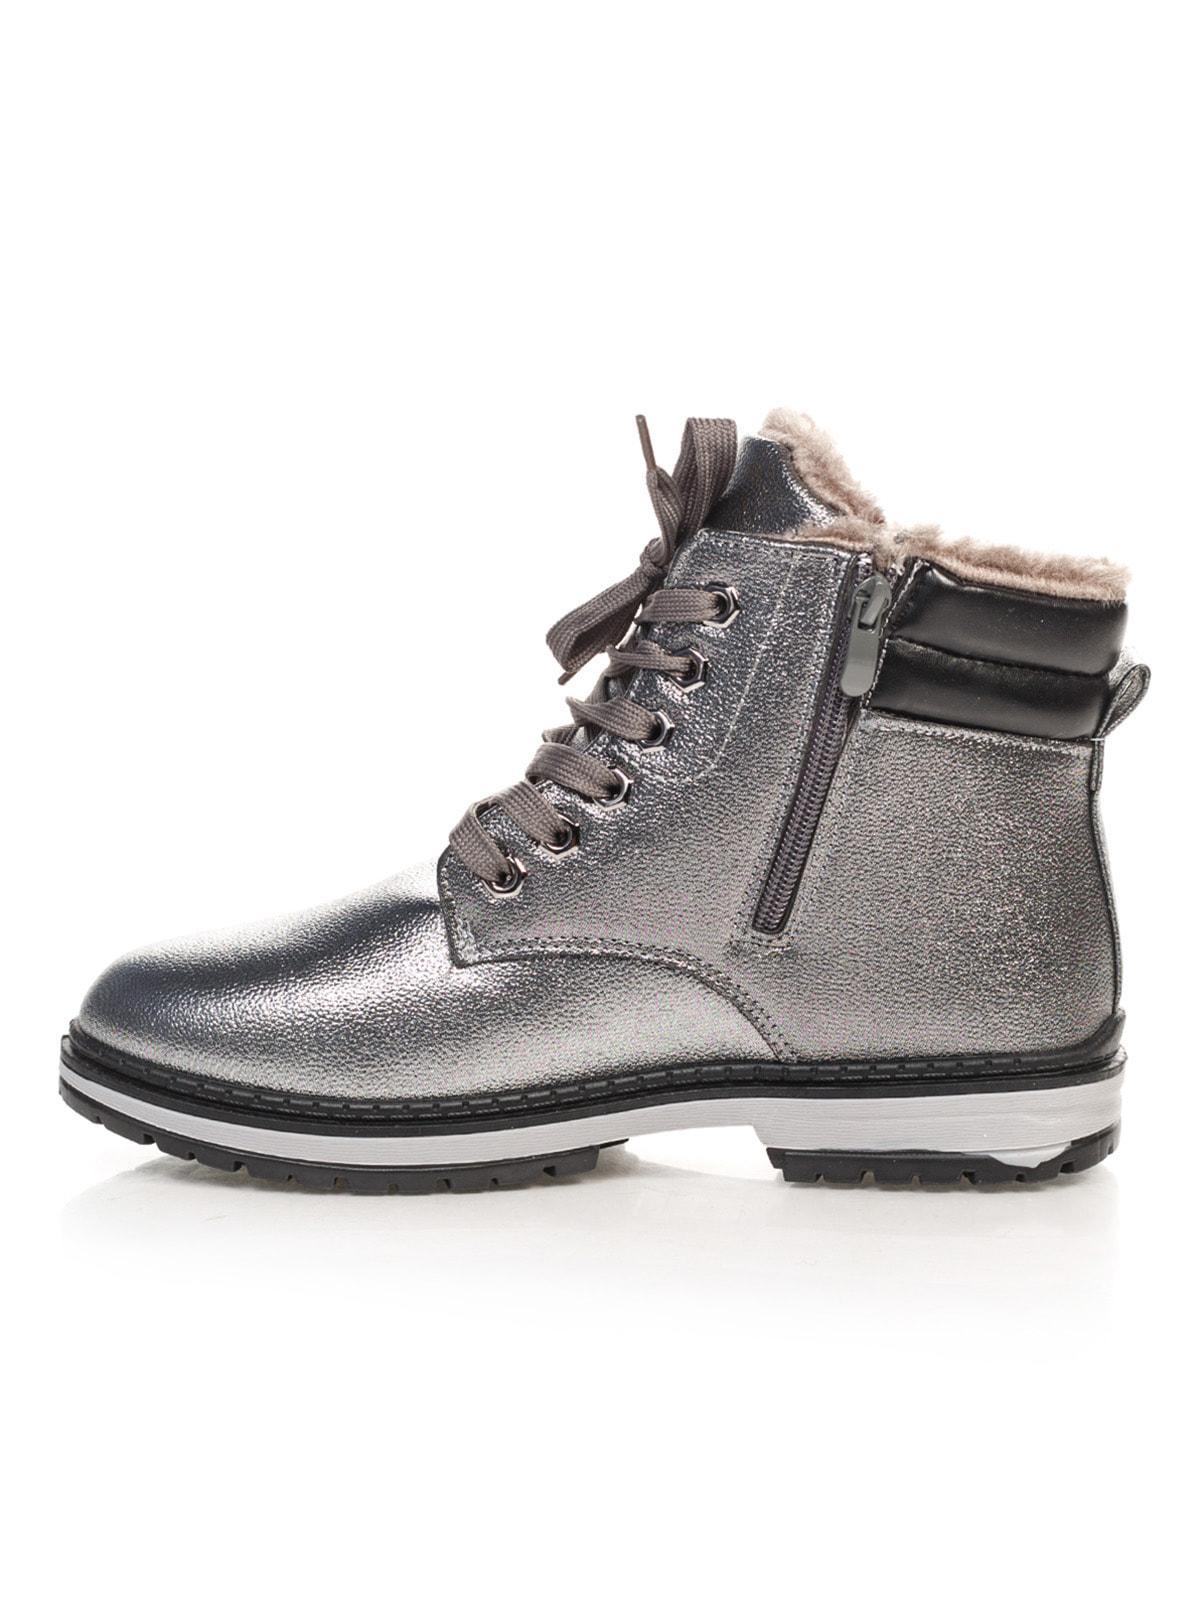 Ботинки серебристые   4663775   фото 2